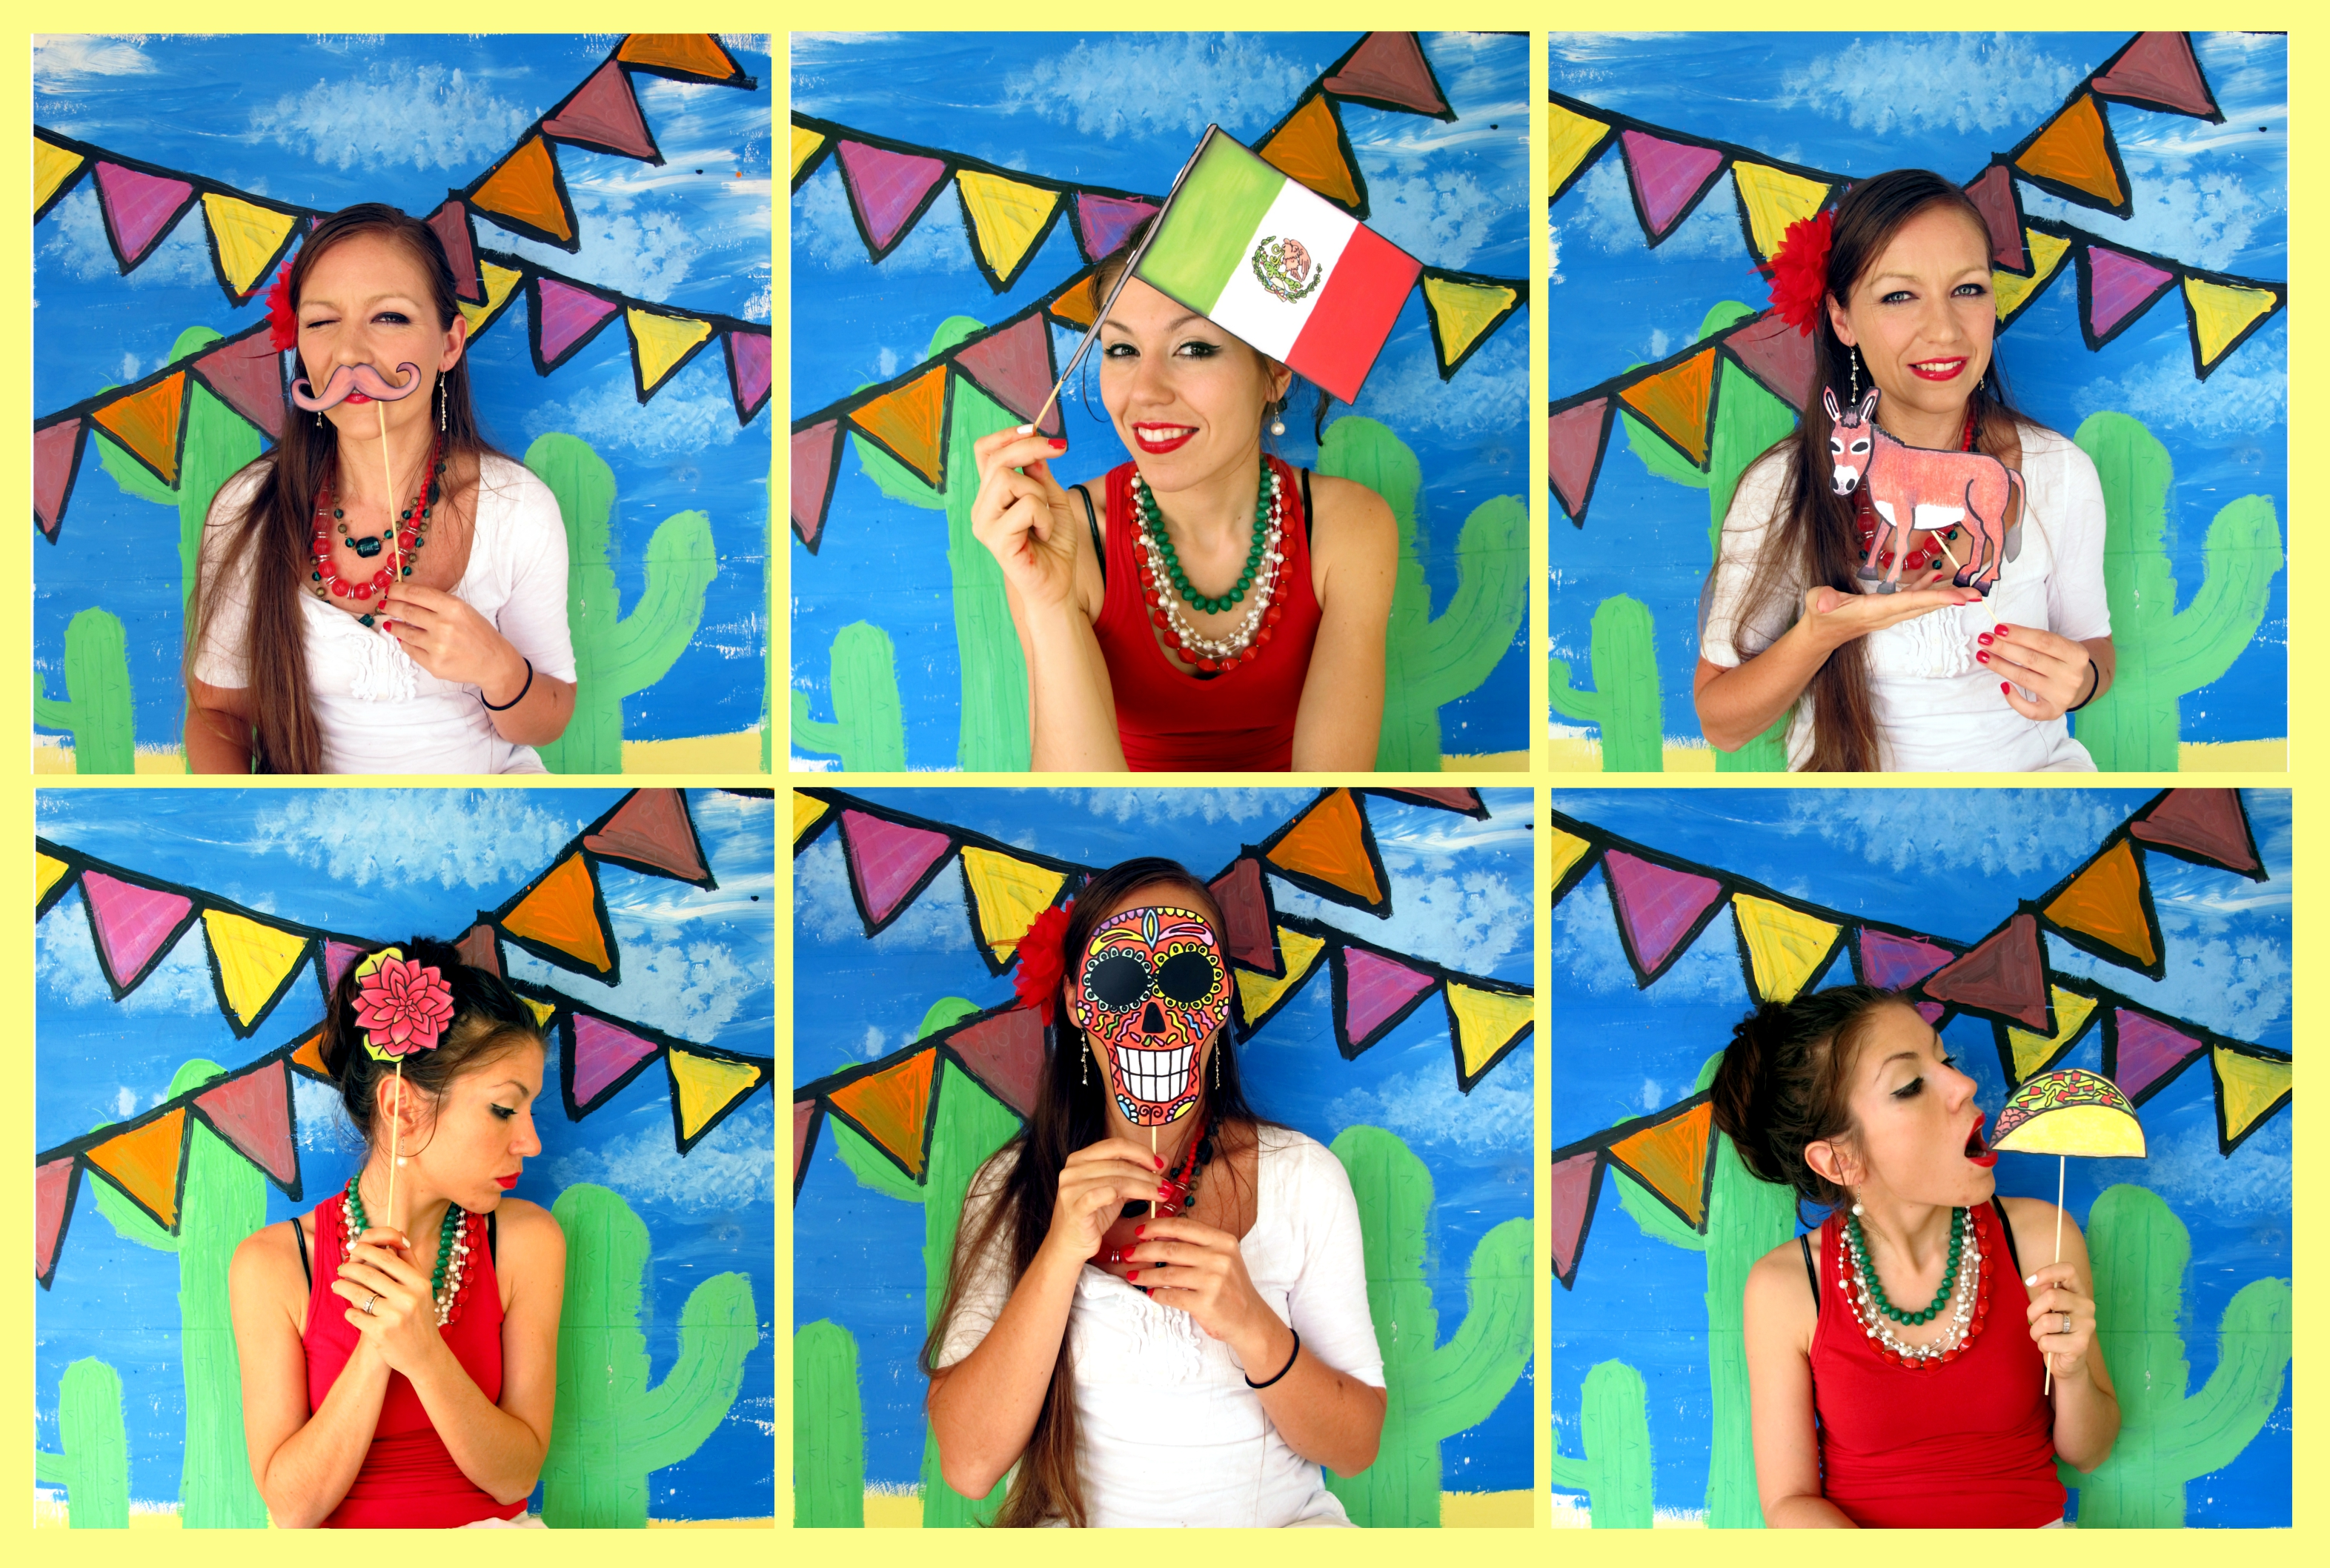 Fiesta Fiesta Fiesta New Photo Props For Cinco De Mayo Or A